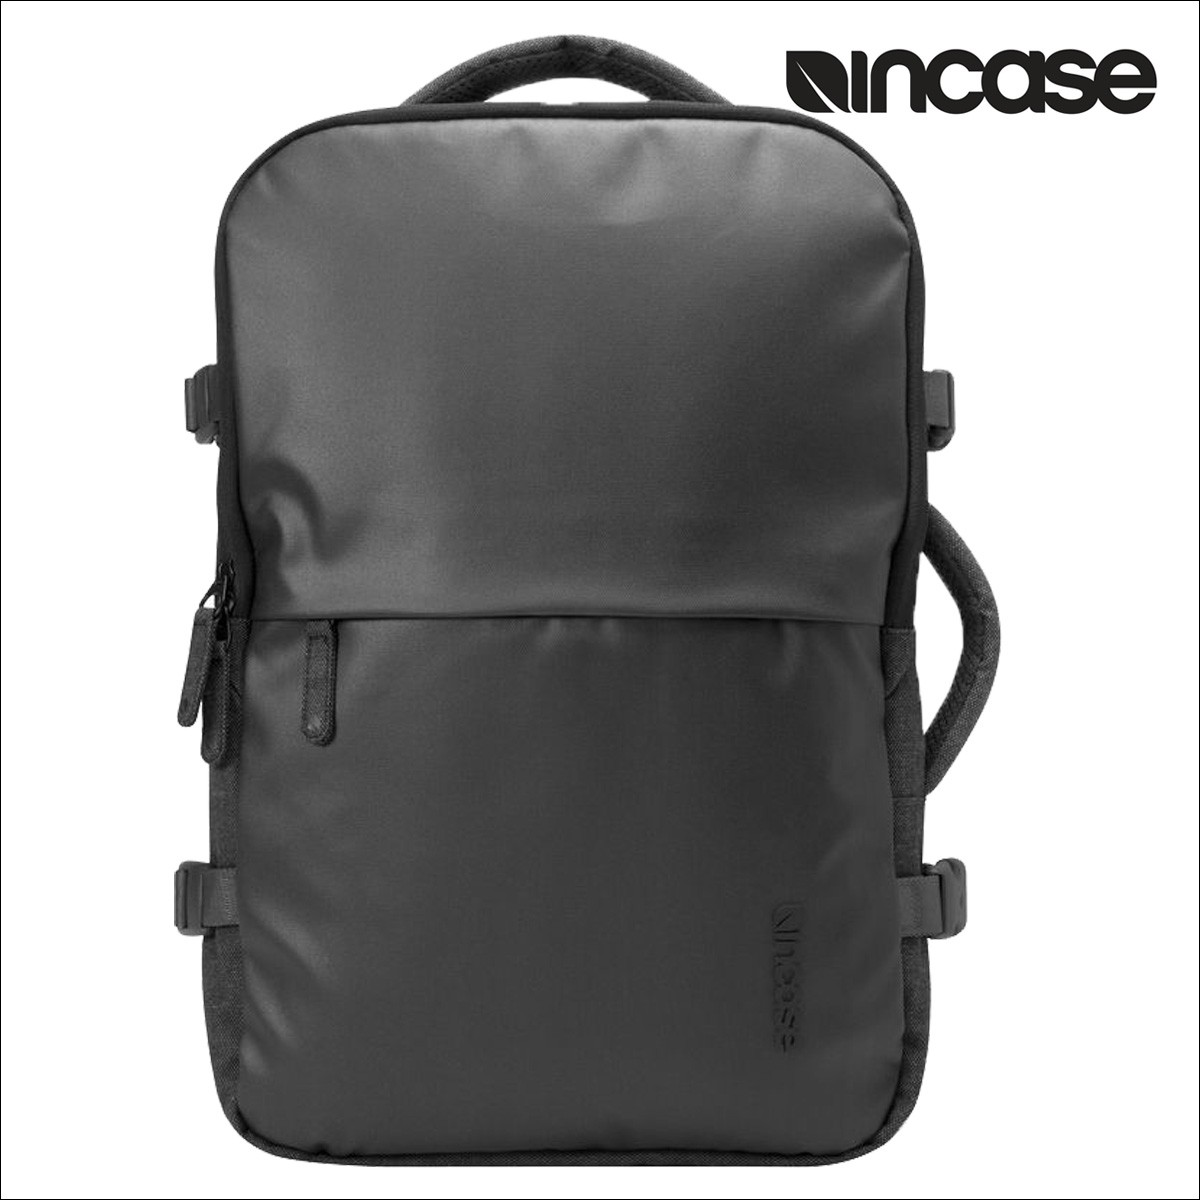 INCASE インケース バックパック リュック 25L EO TRAVEL BACKPACK CL90004 レディース メンズ ブラック